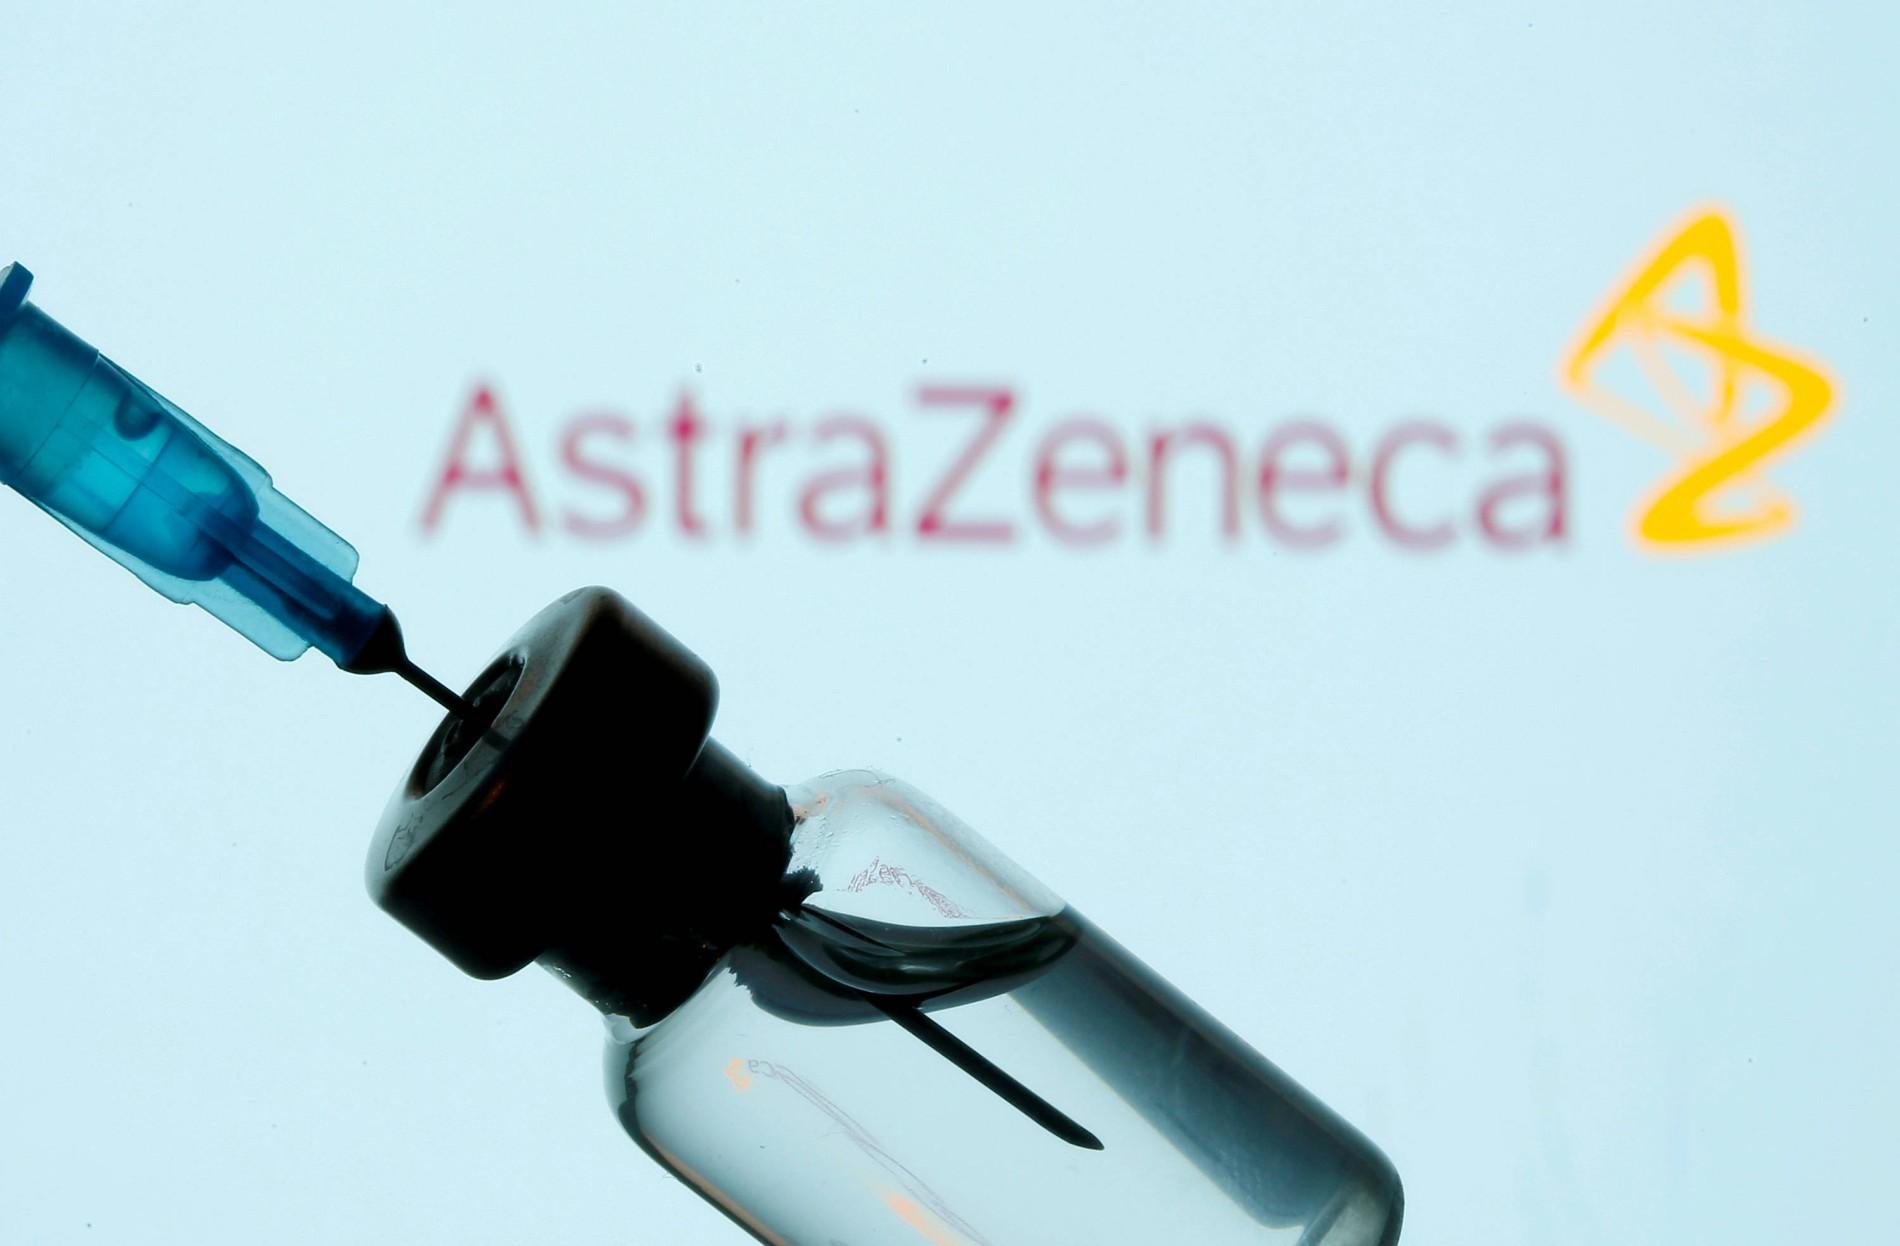 stiko empfiehlt astrazeneca impfstoff